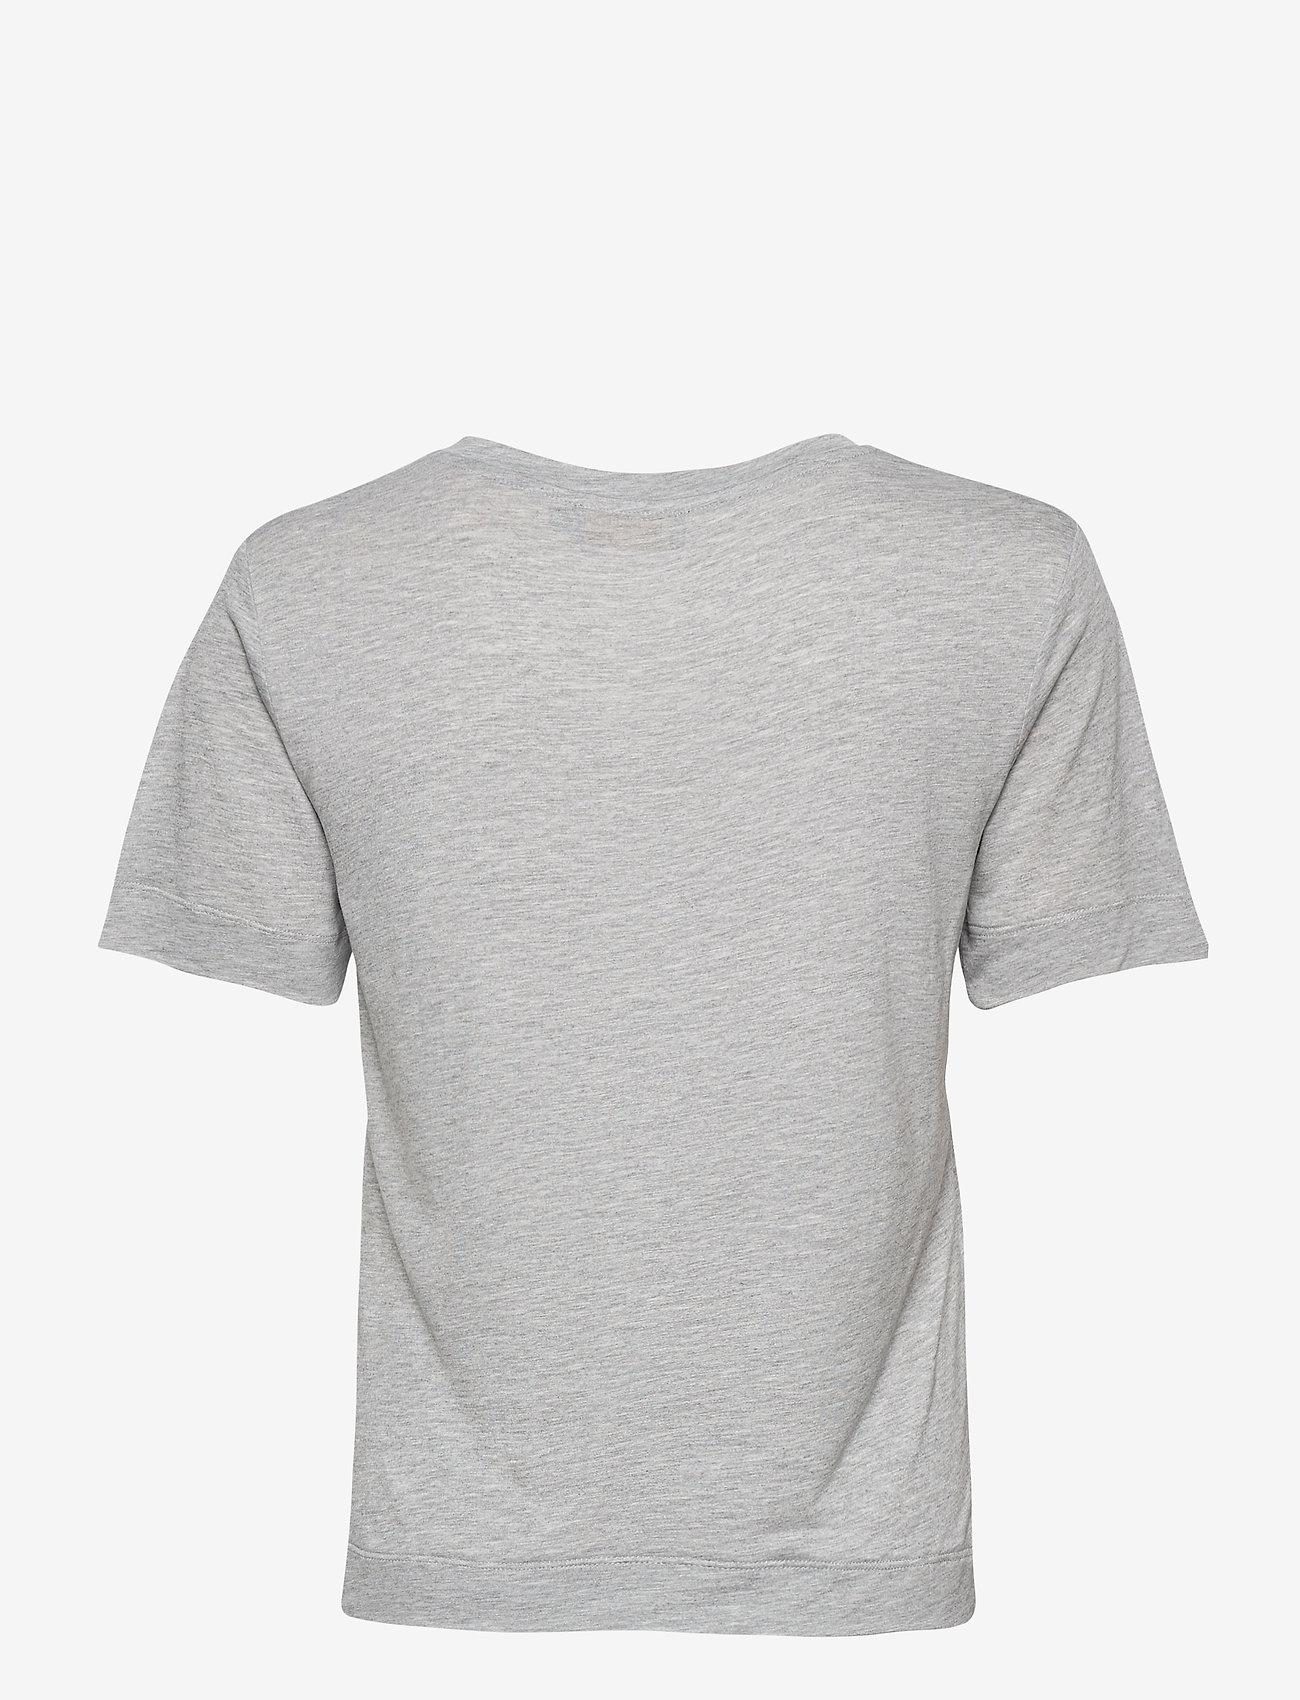 Morris Lady - Jeanie Tee - t-shirts - grey - 1